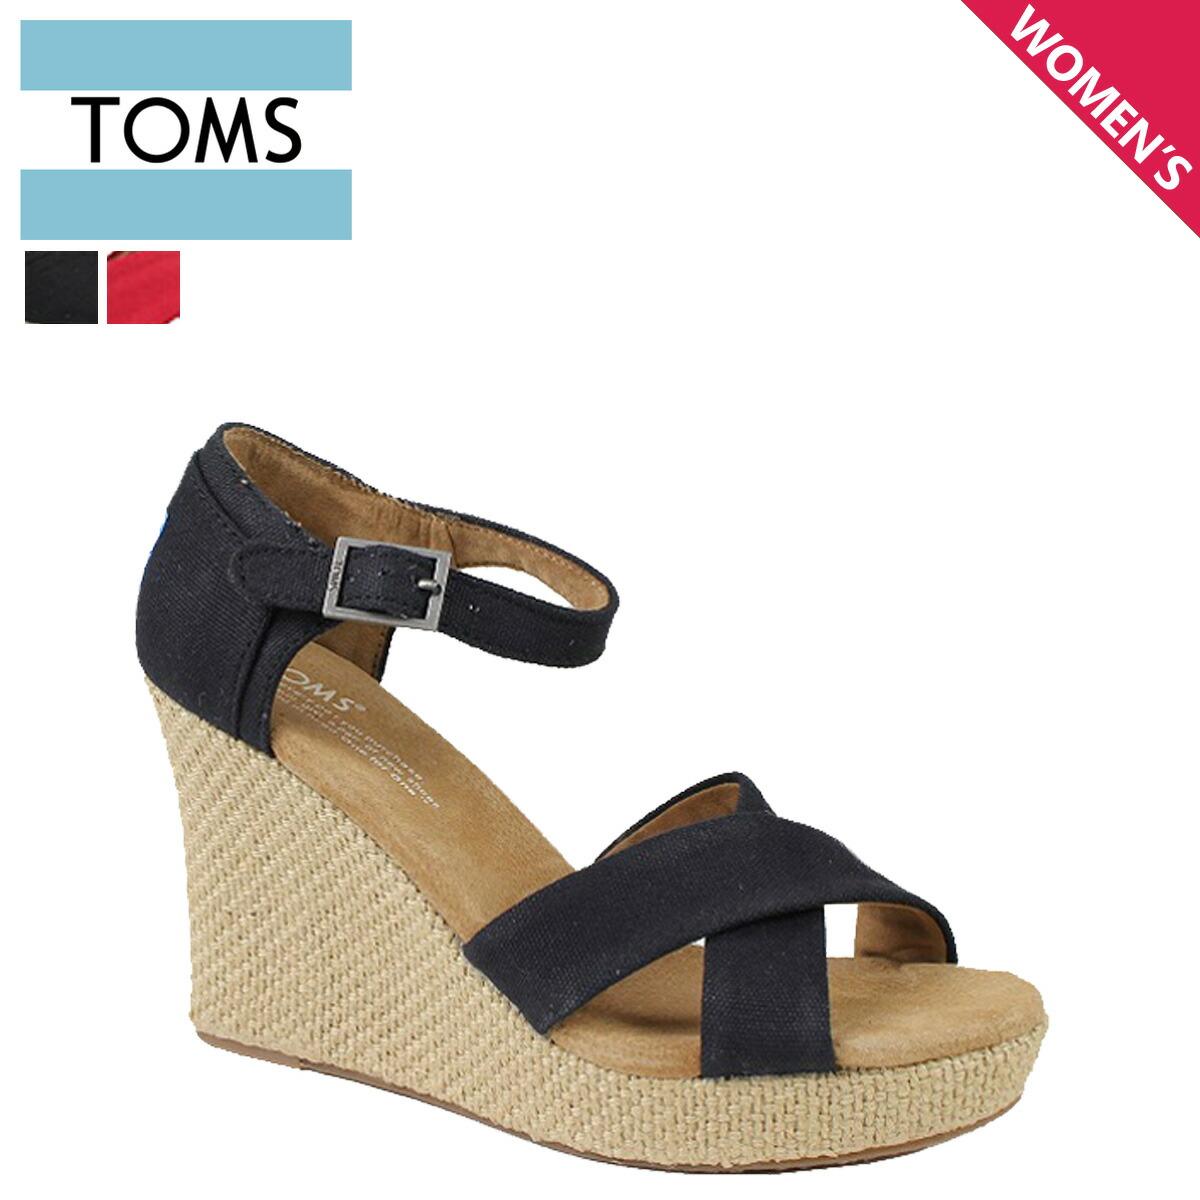 ALLSPORTS: Thoms Shoes TOMS SHOES Lady's Sandals CANVAS